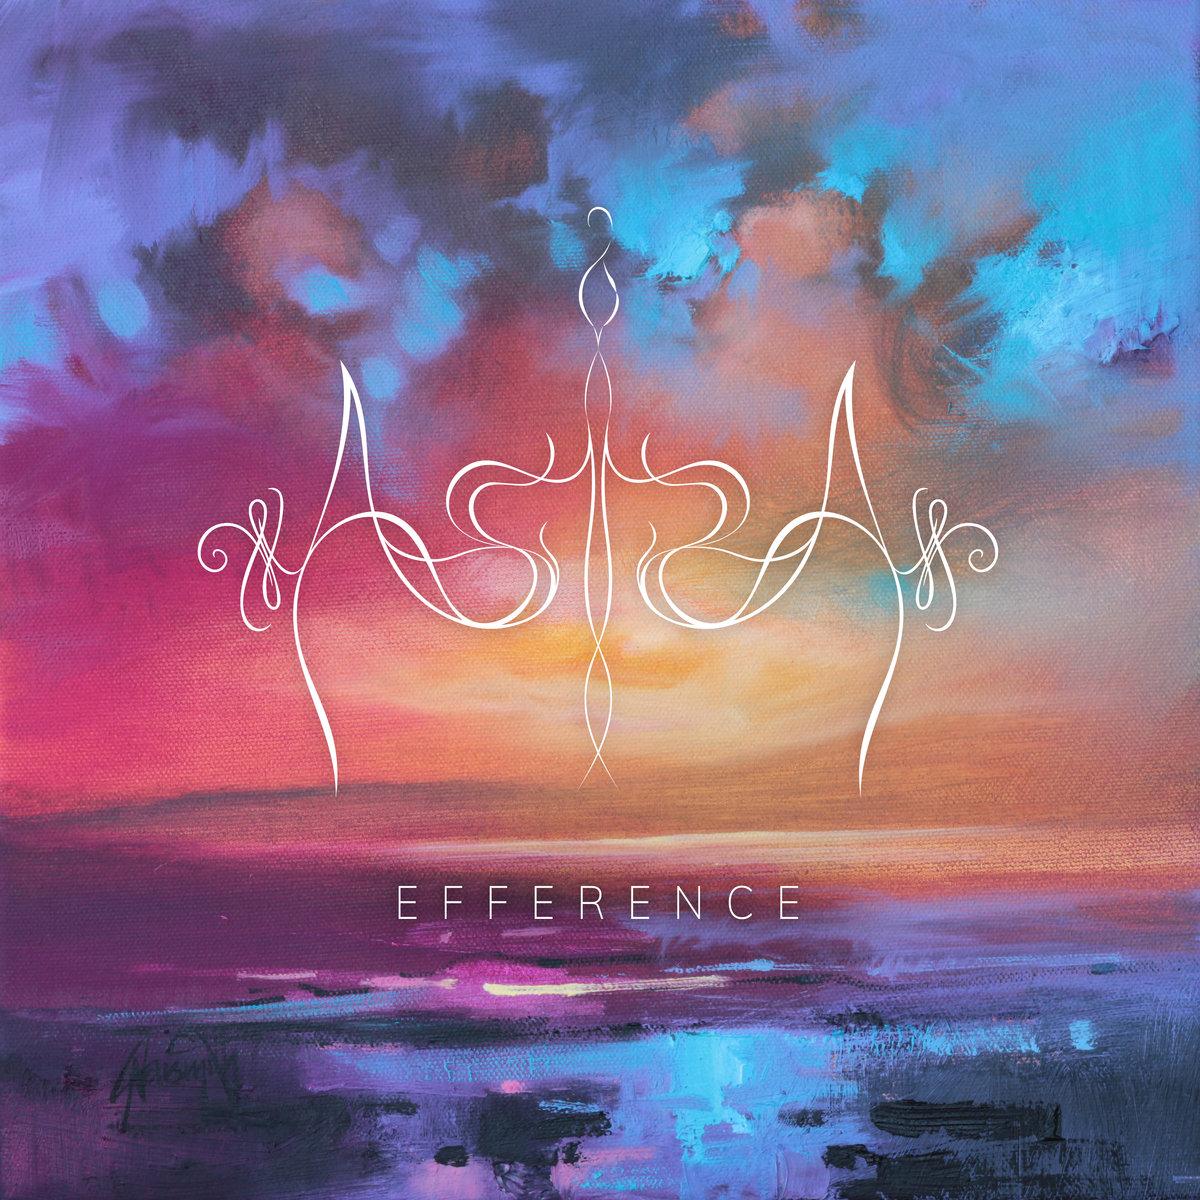 Asira - Efference